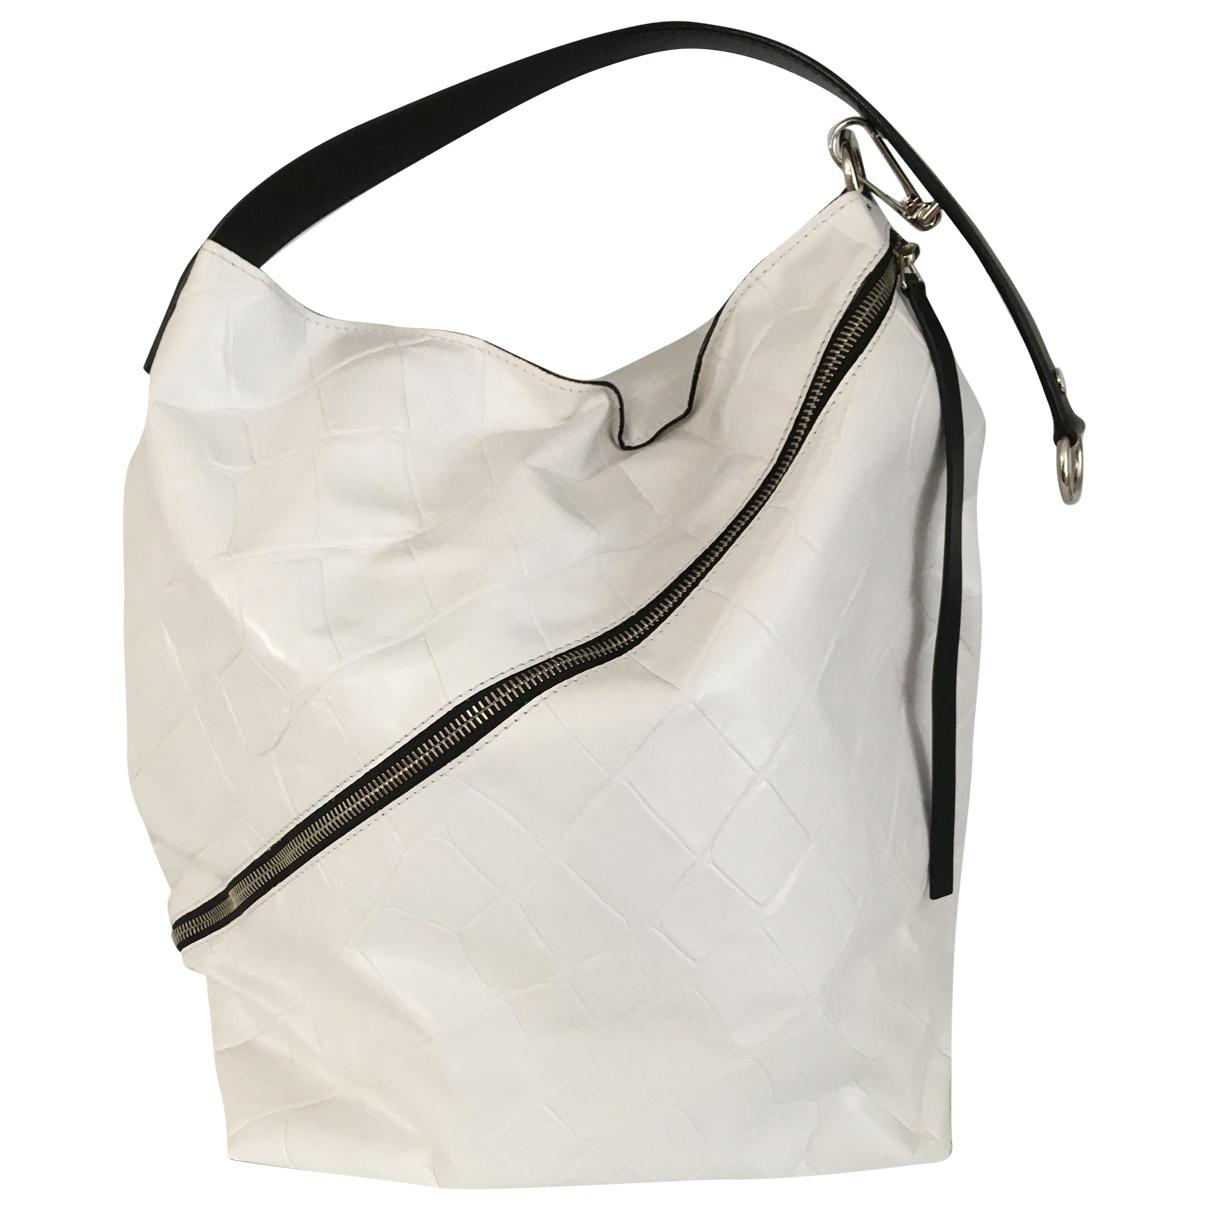 Proenza Schouler - Sac a main Zip Hobo pour femme en cuir - blanc